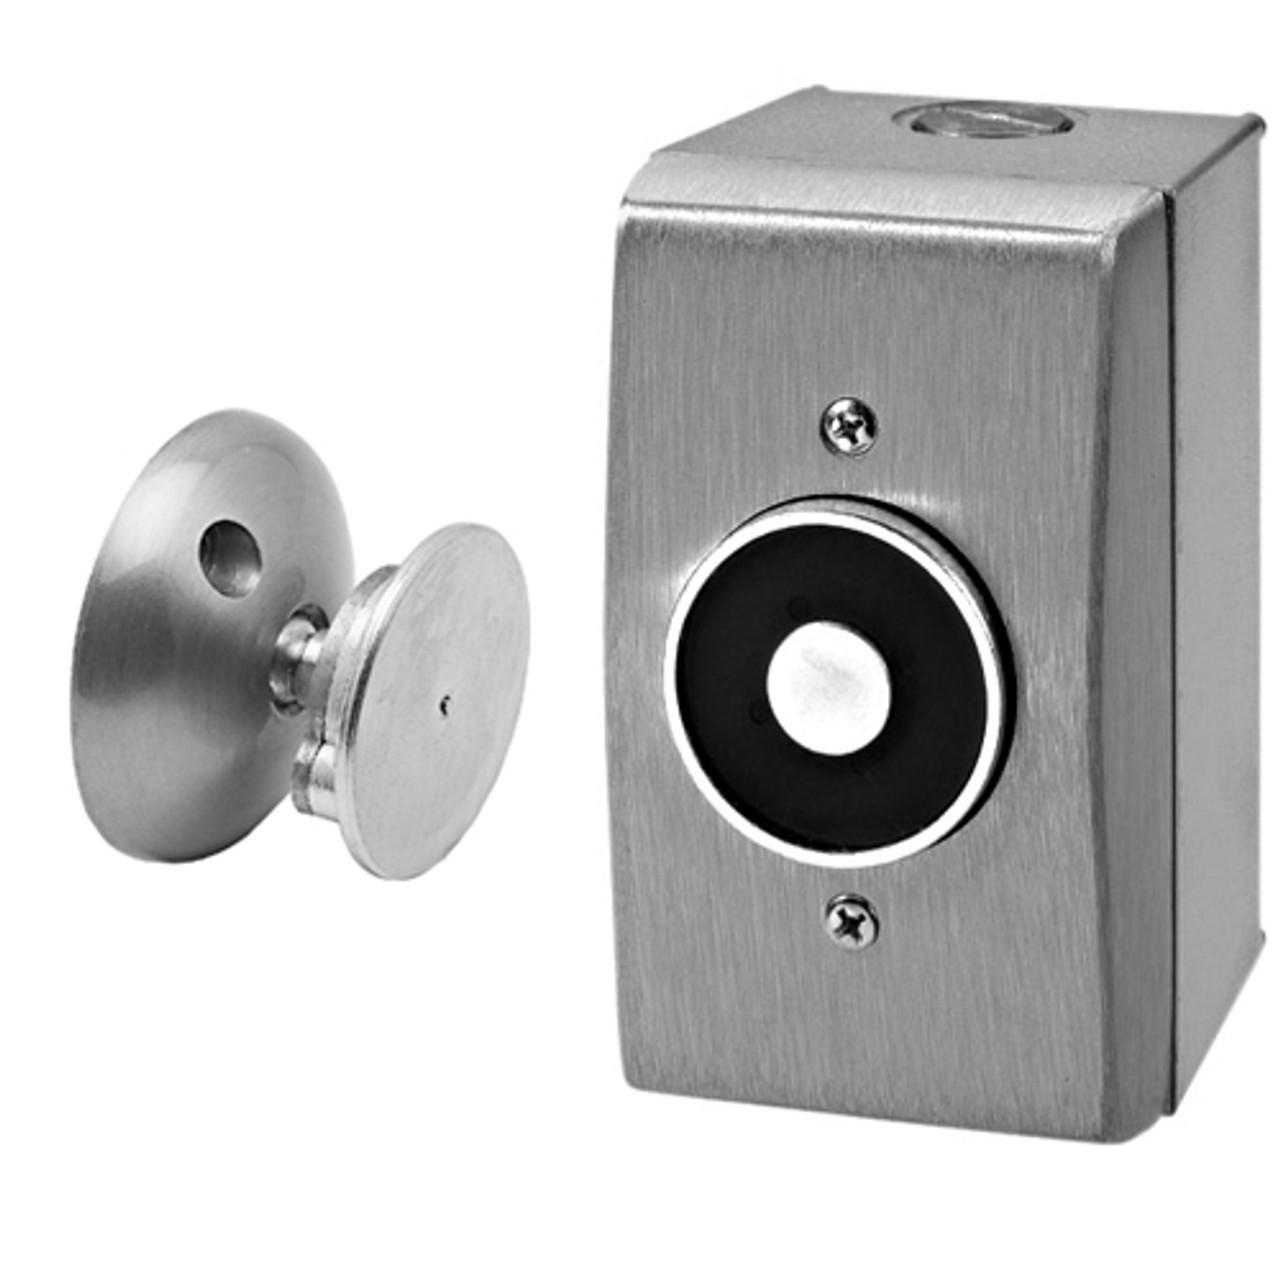 2805-US28 DynaLock 2800 Series Surface Wall Mount Electromagnetic Door Holder in Satin Aluminum